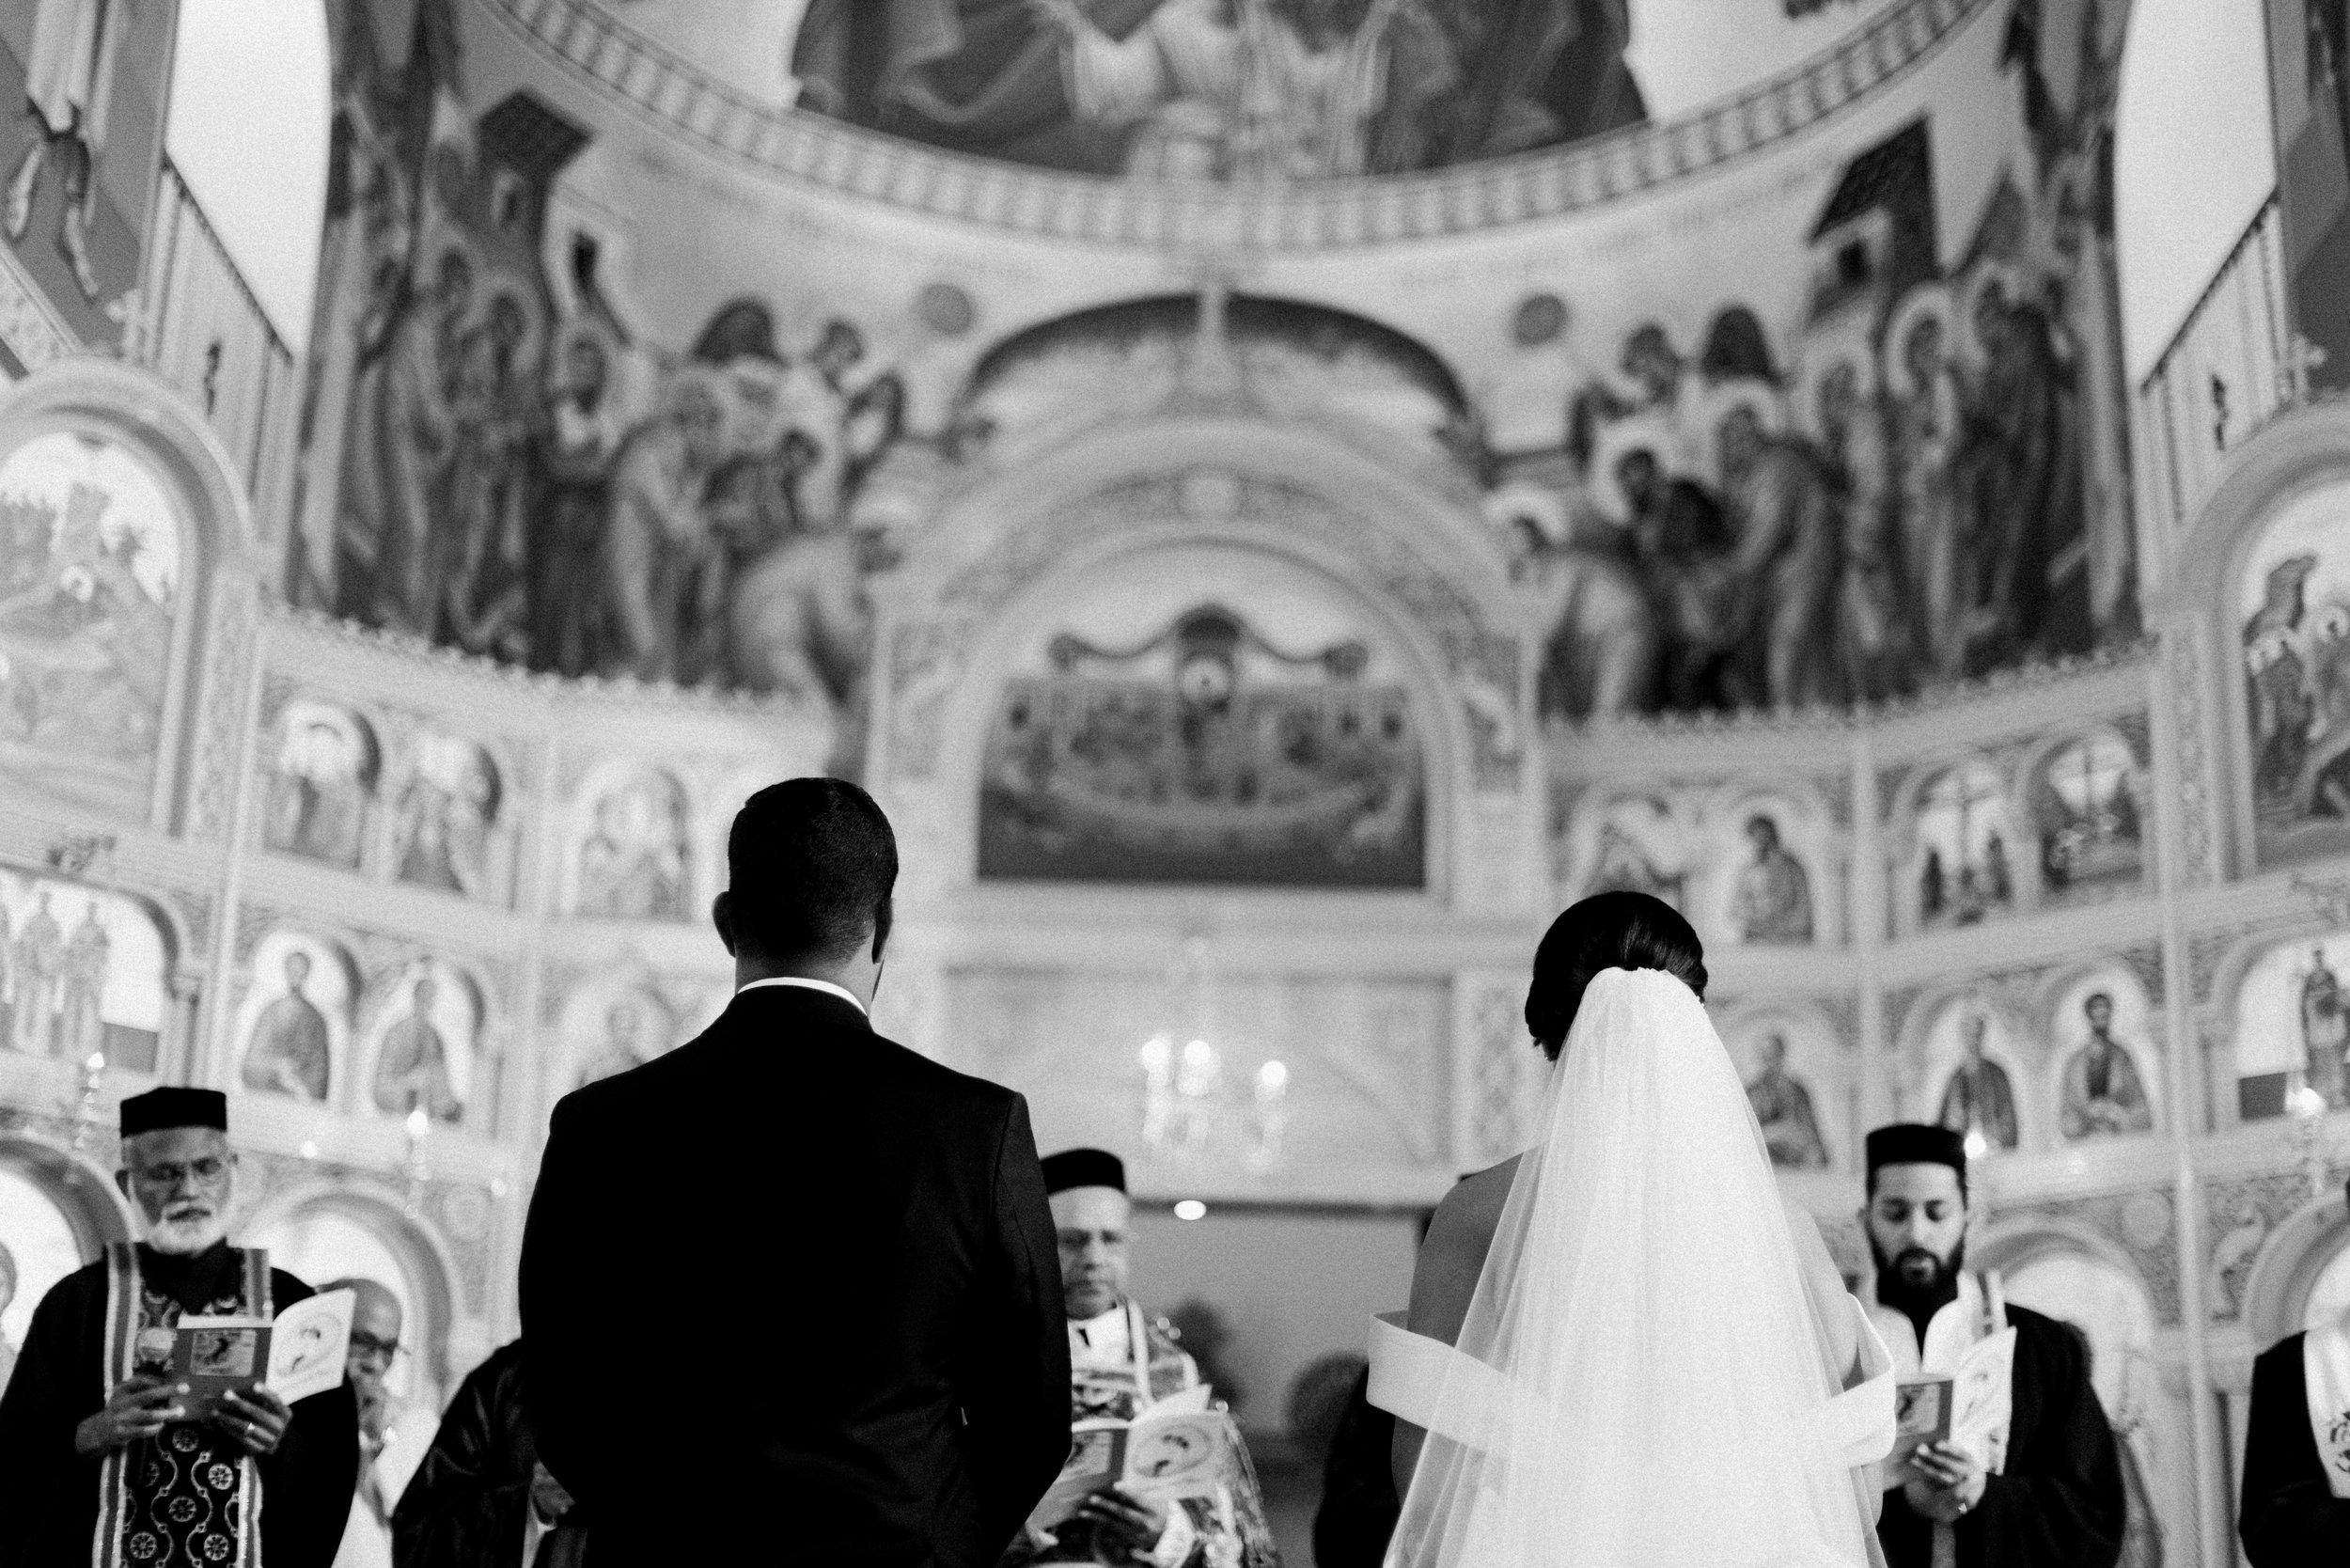 Fine-Art-Film-Houston-Wedding-Photographer-Best-Top-Luxury-Texas-Austin-Dallas-Destination-Dana-Fernandez-Photography-The-Bell-Tower-on-34th-Indian-13.jpg